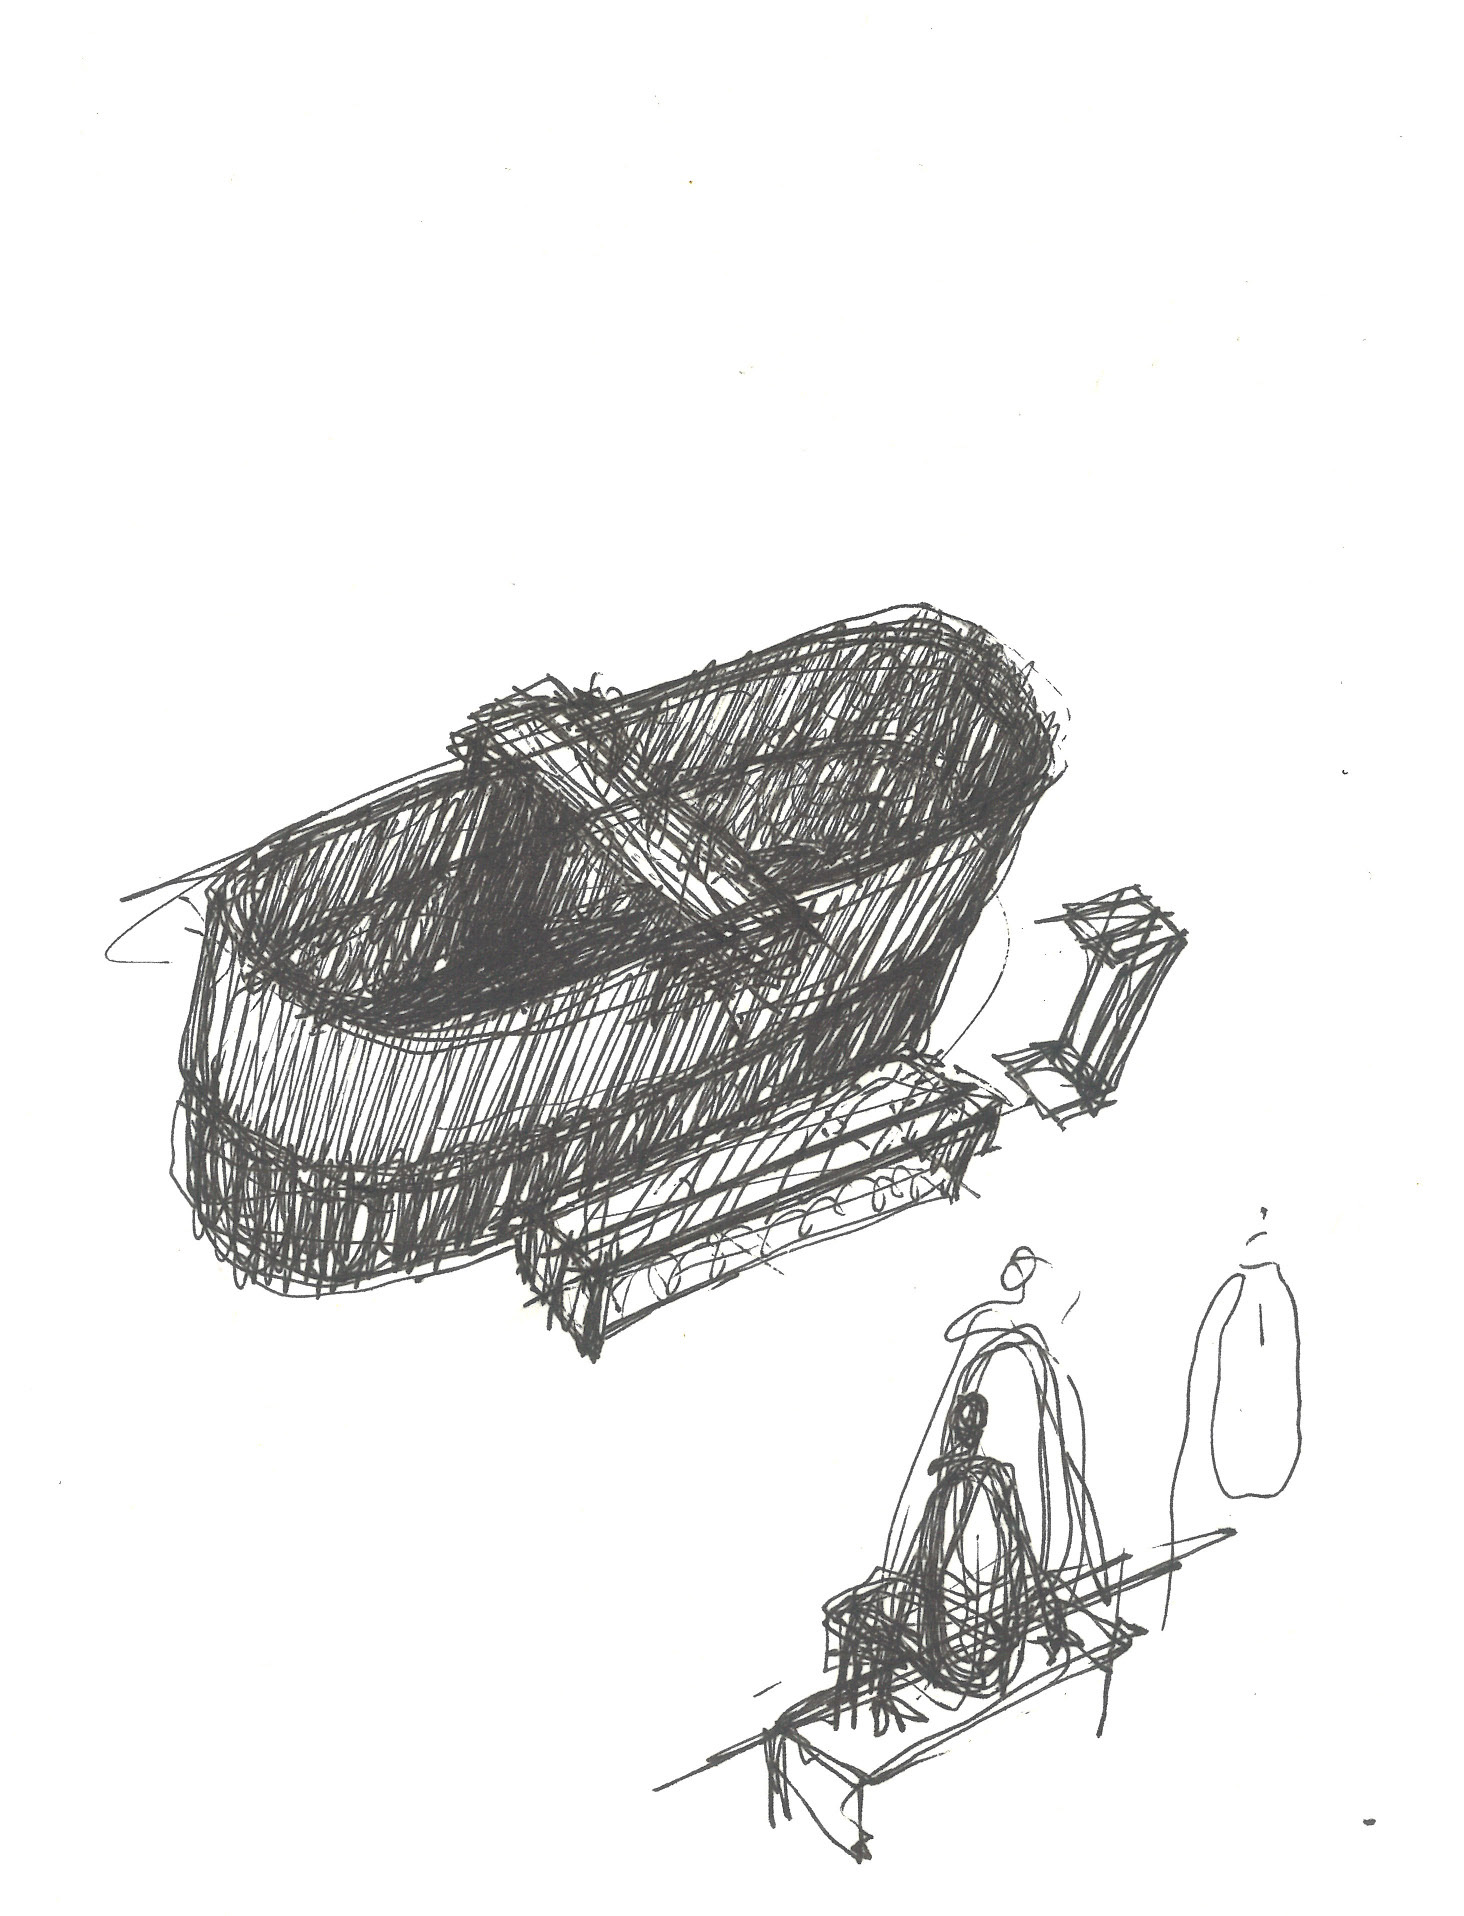 sketch by Lyndon Neri Lyndon Neri}